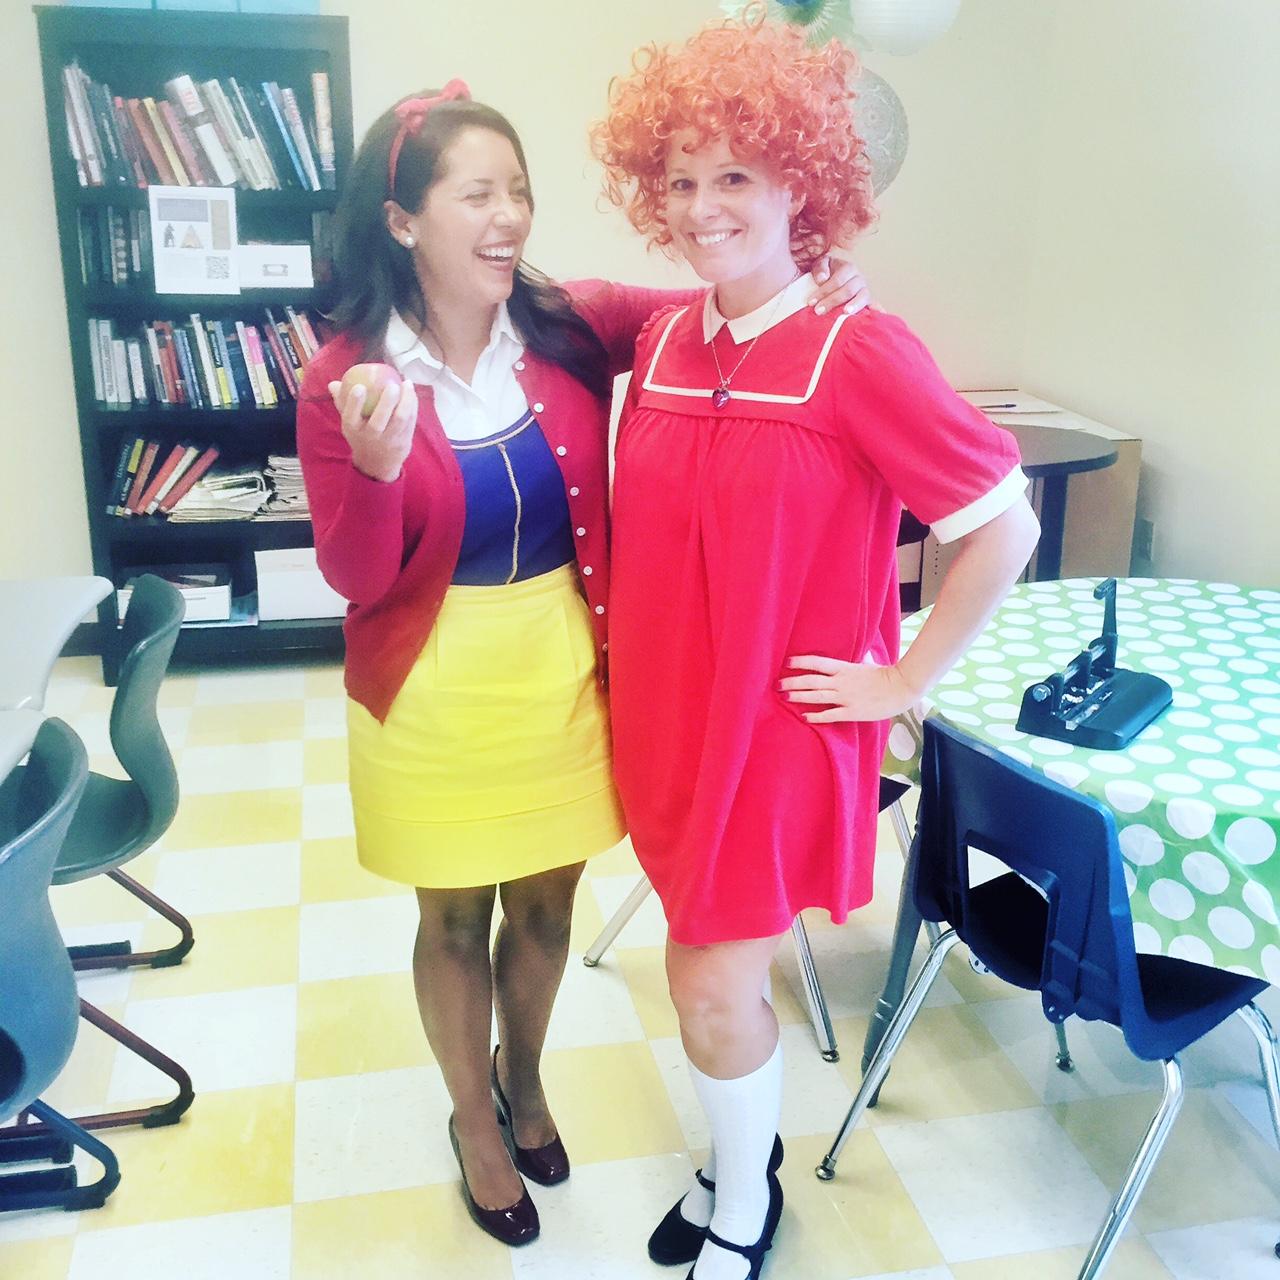 sc 1 st  Crafty Teacher Lady & Crafty Teacher Lady: Teacher Friendly Halloween Costume Ideas